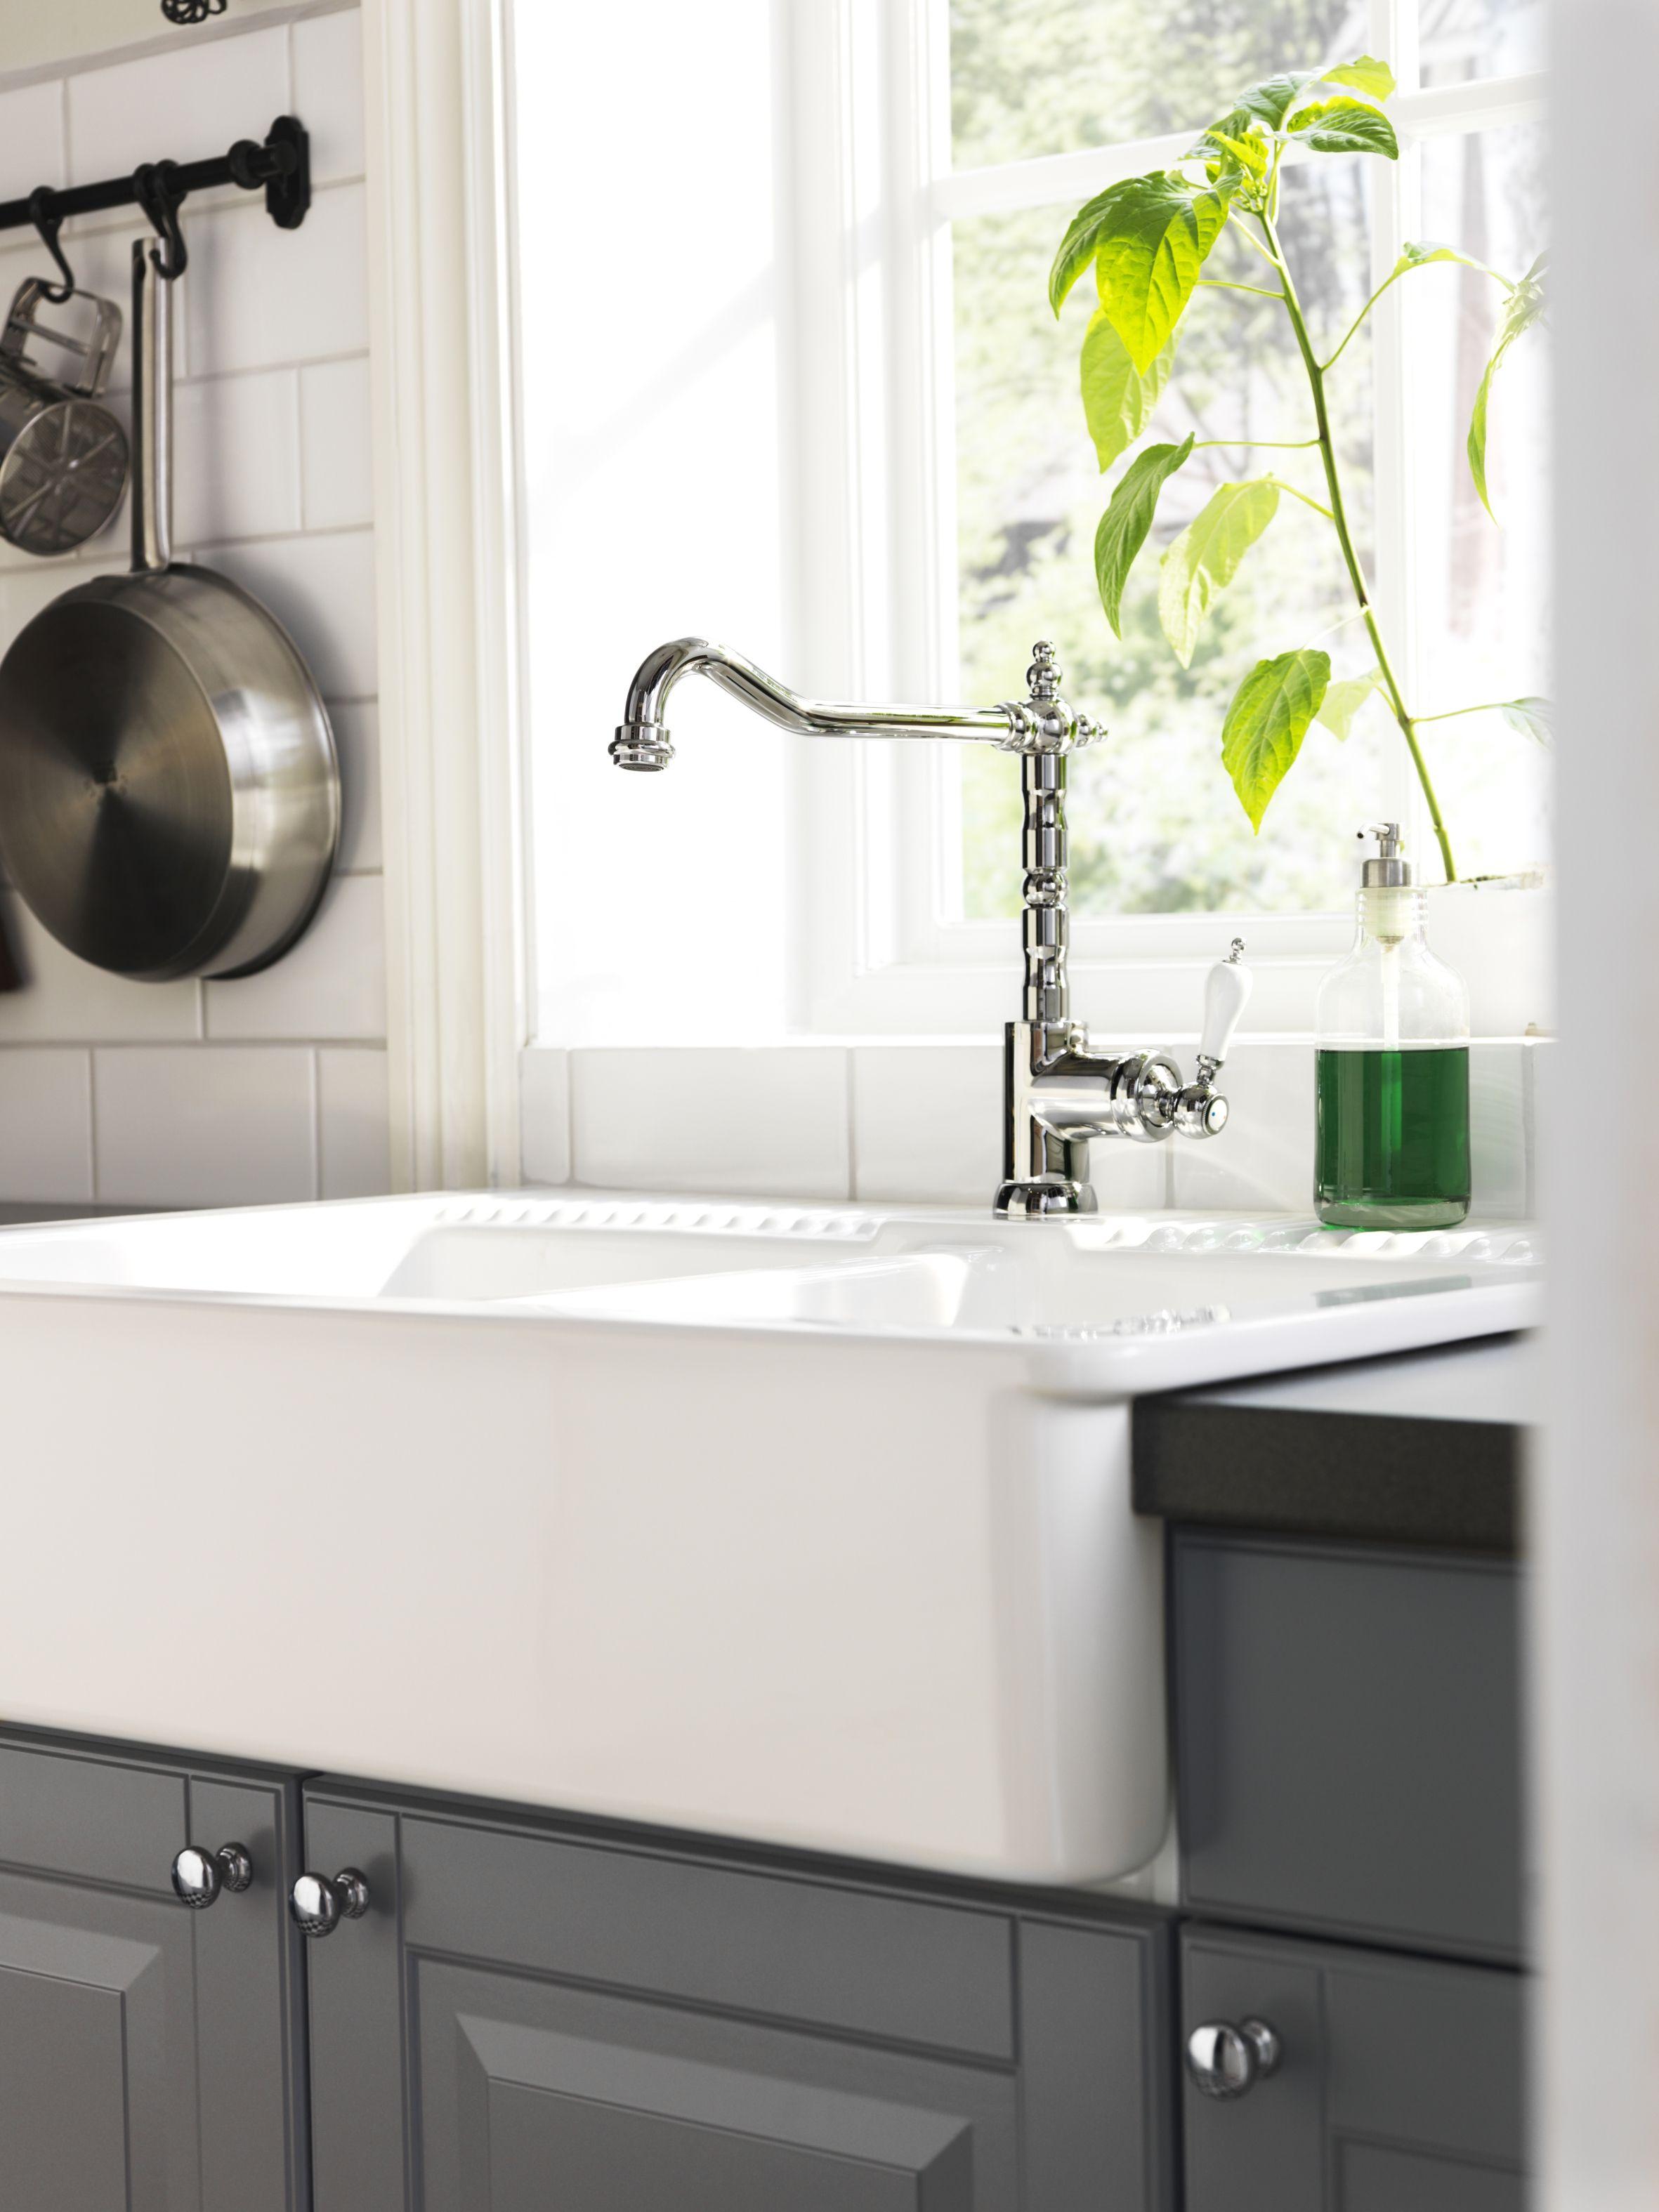 dayri style porcelain kitchen sinks me farm for farmhouse faucet sink faucets